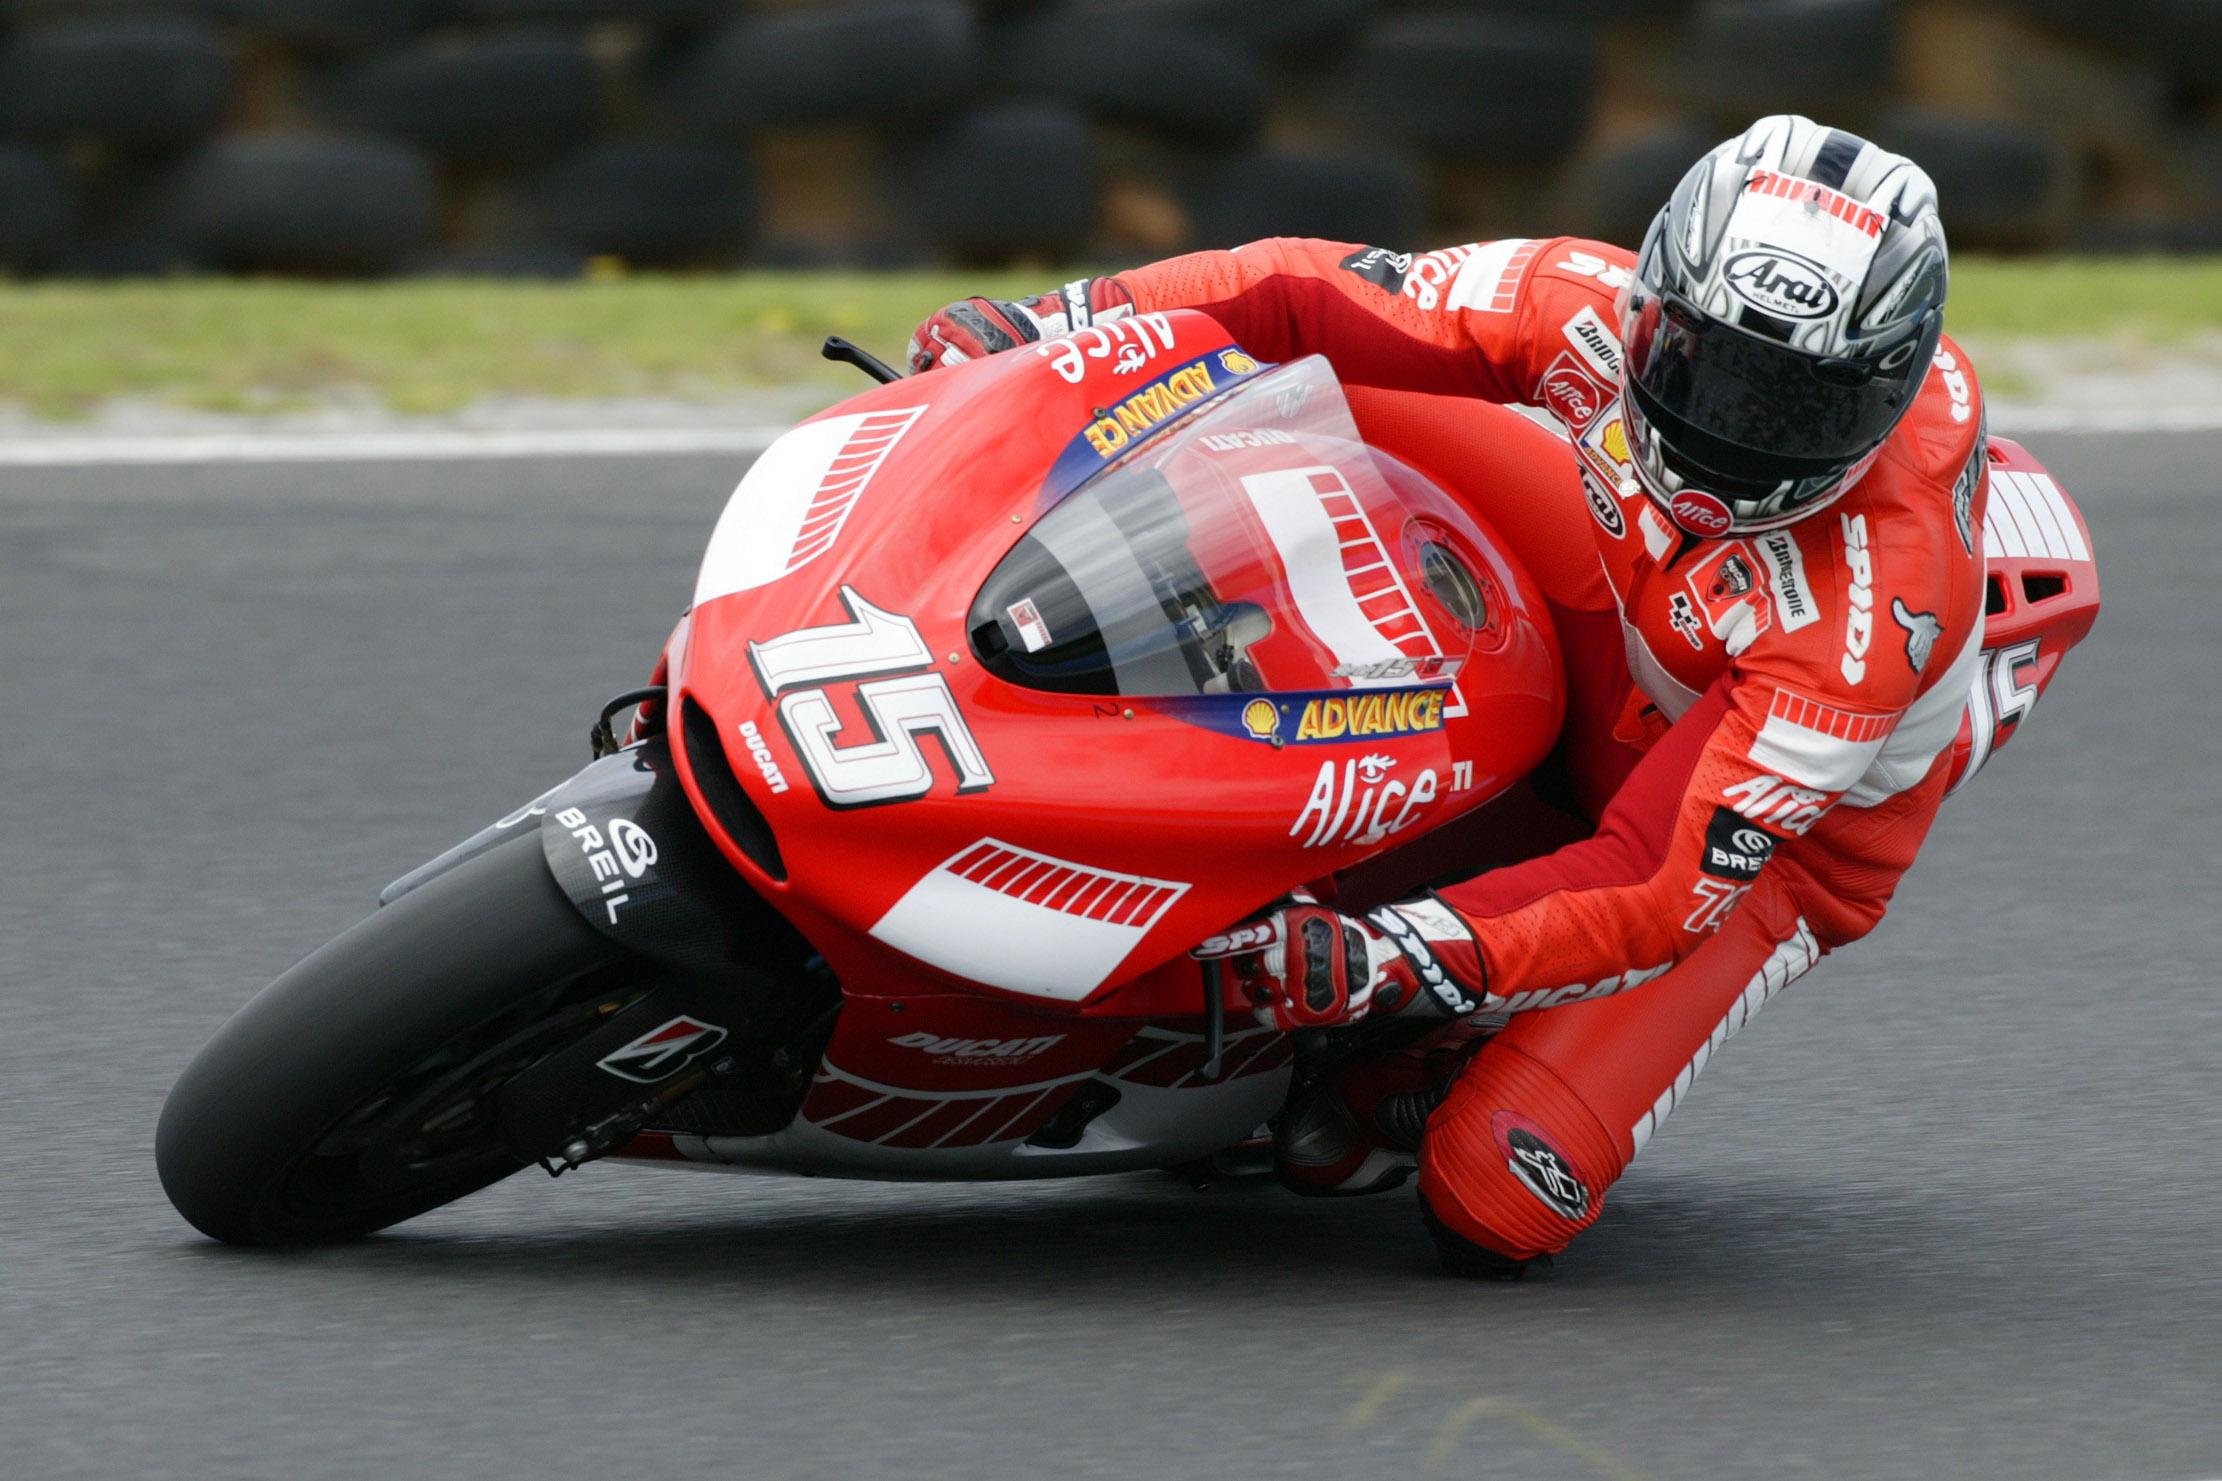 12) Josè Luis Cardoso (Ducati)